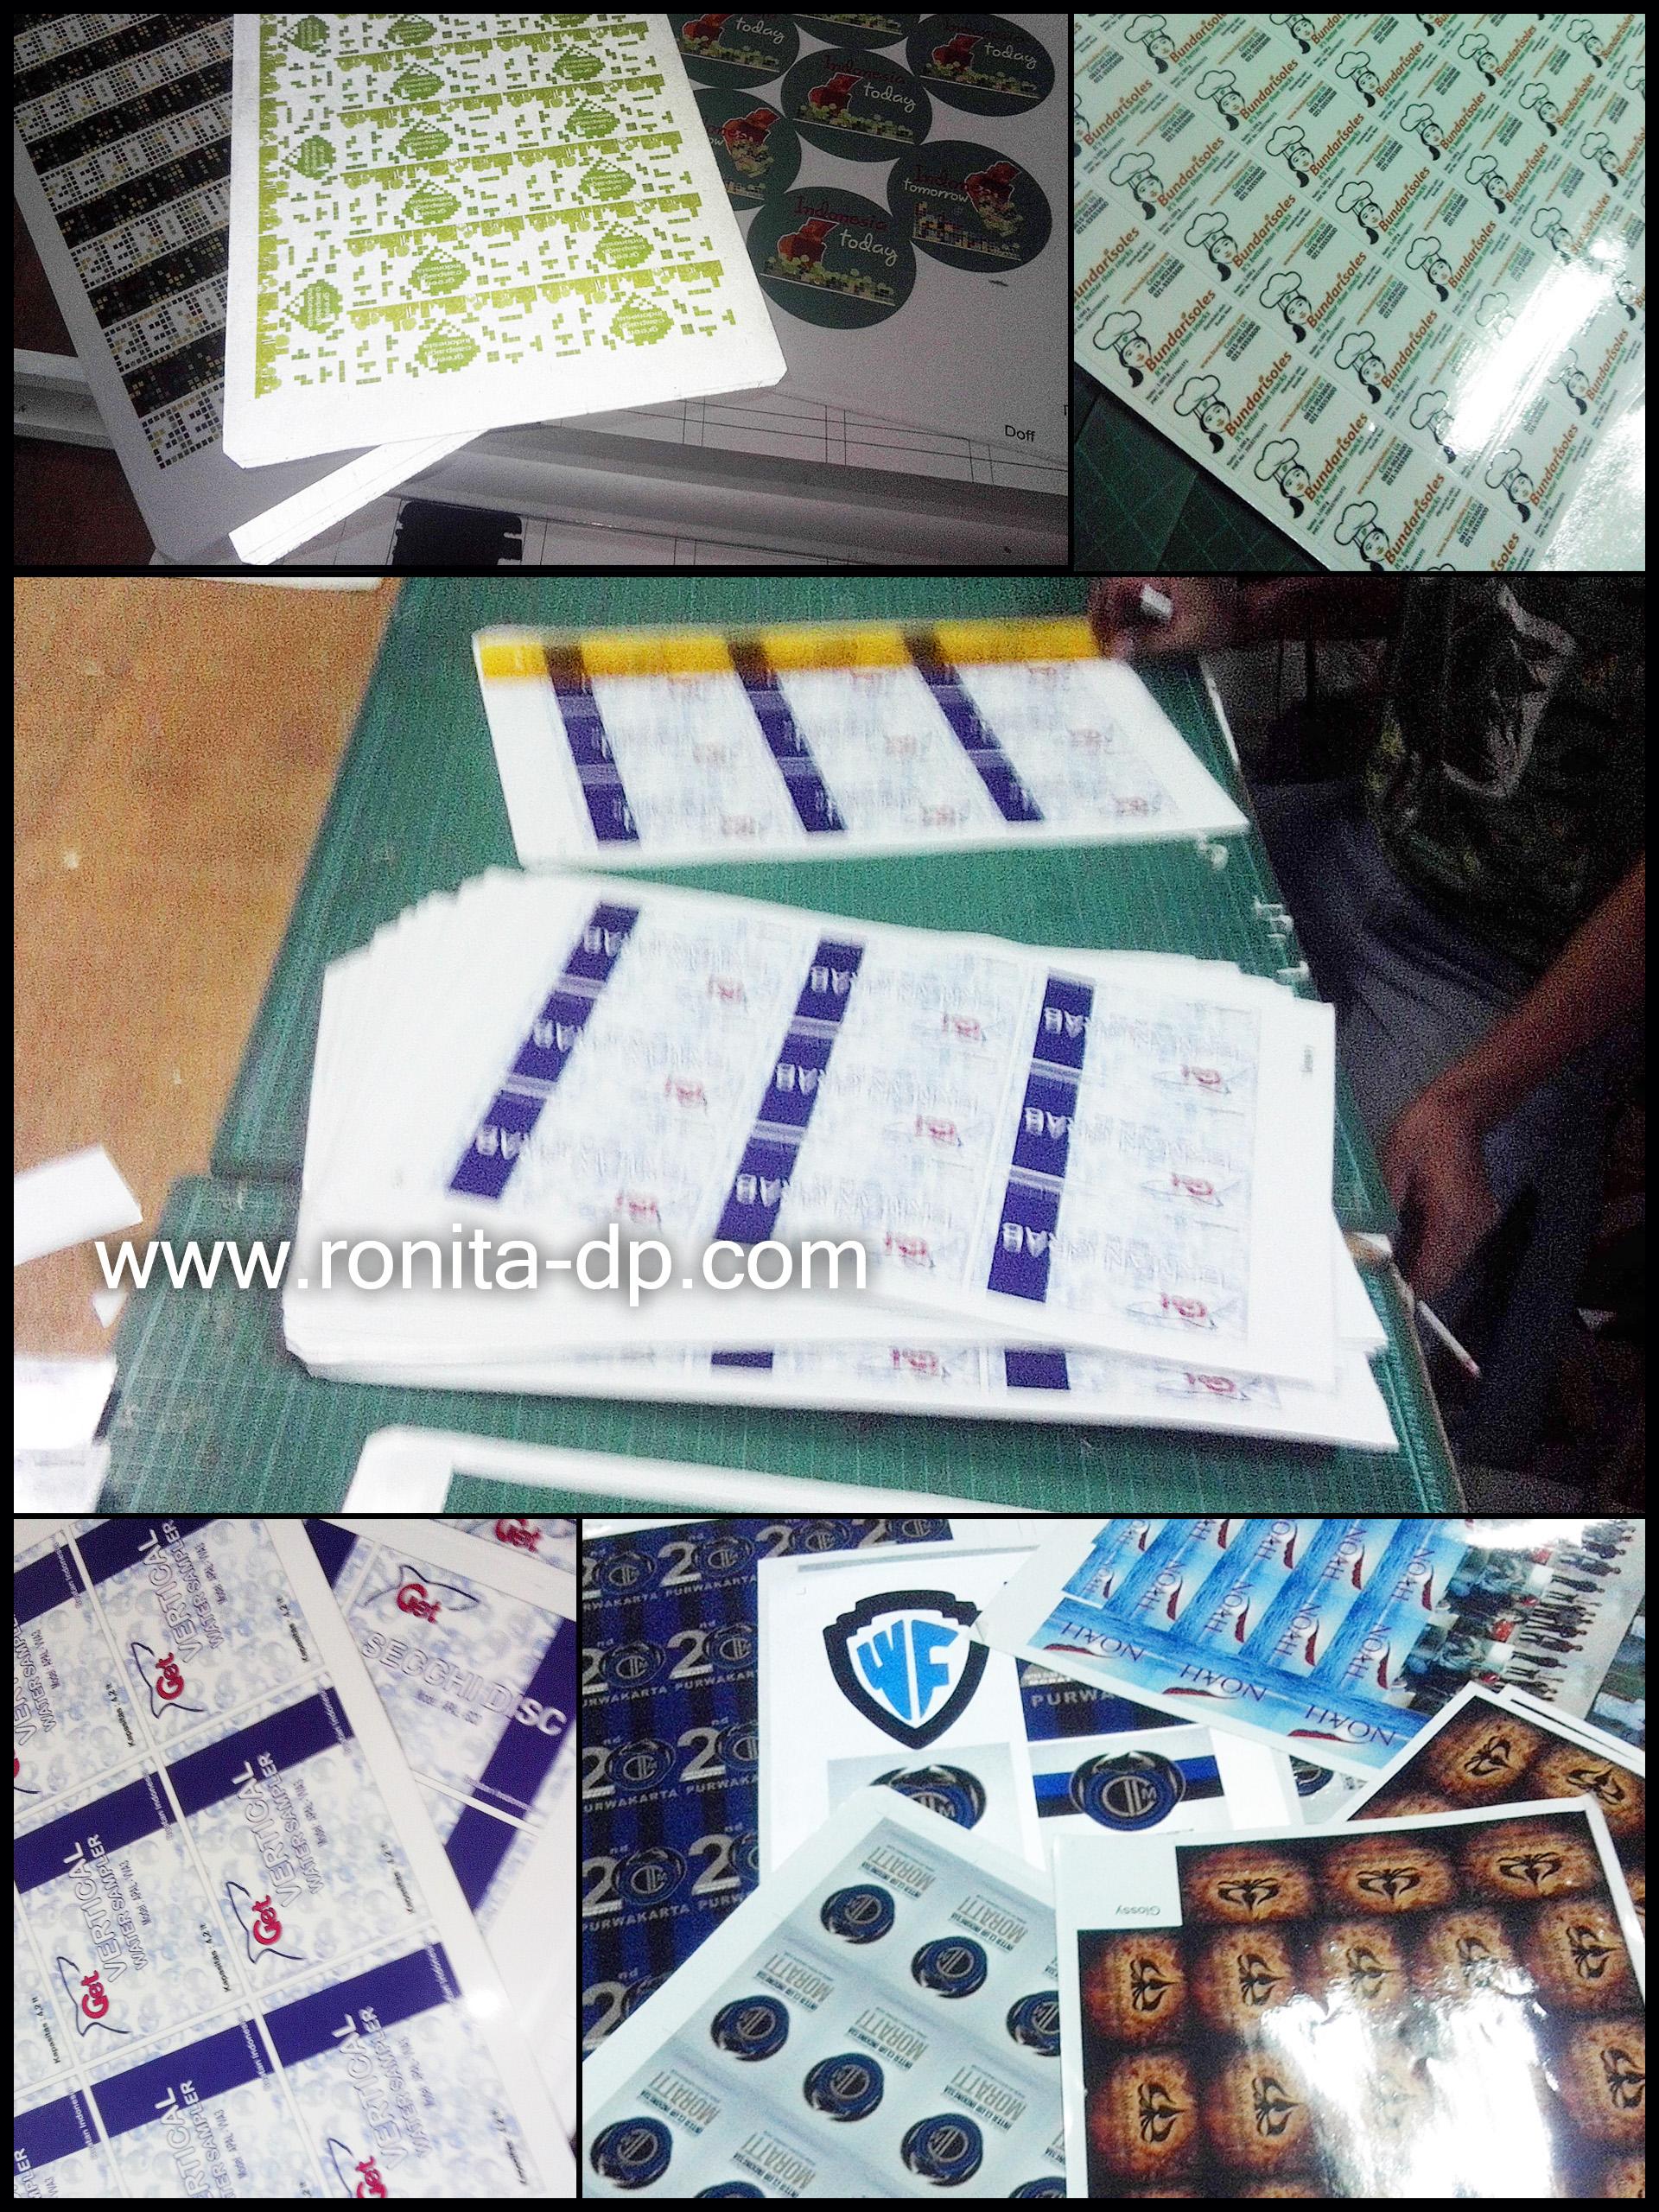 Layanan cetak sticker a3 fujixerox ronita dp ronita digital printing